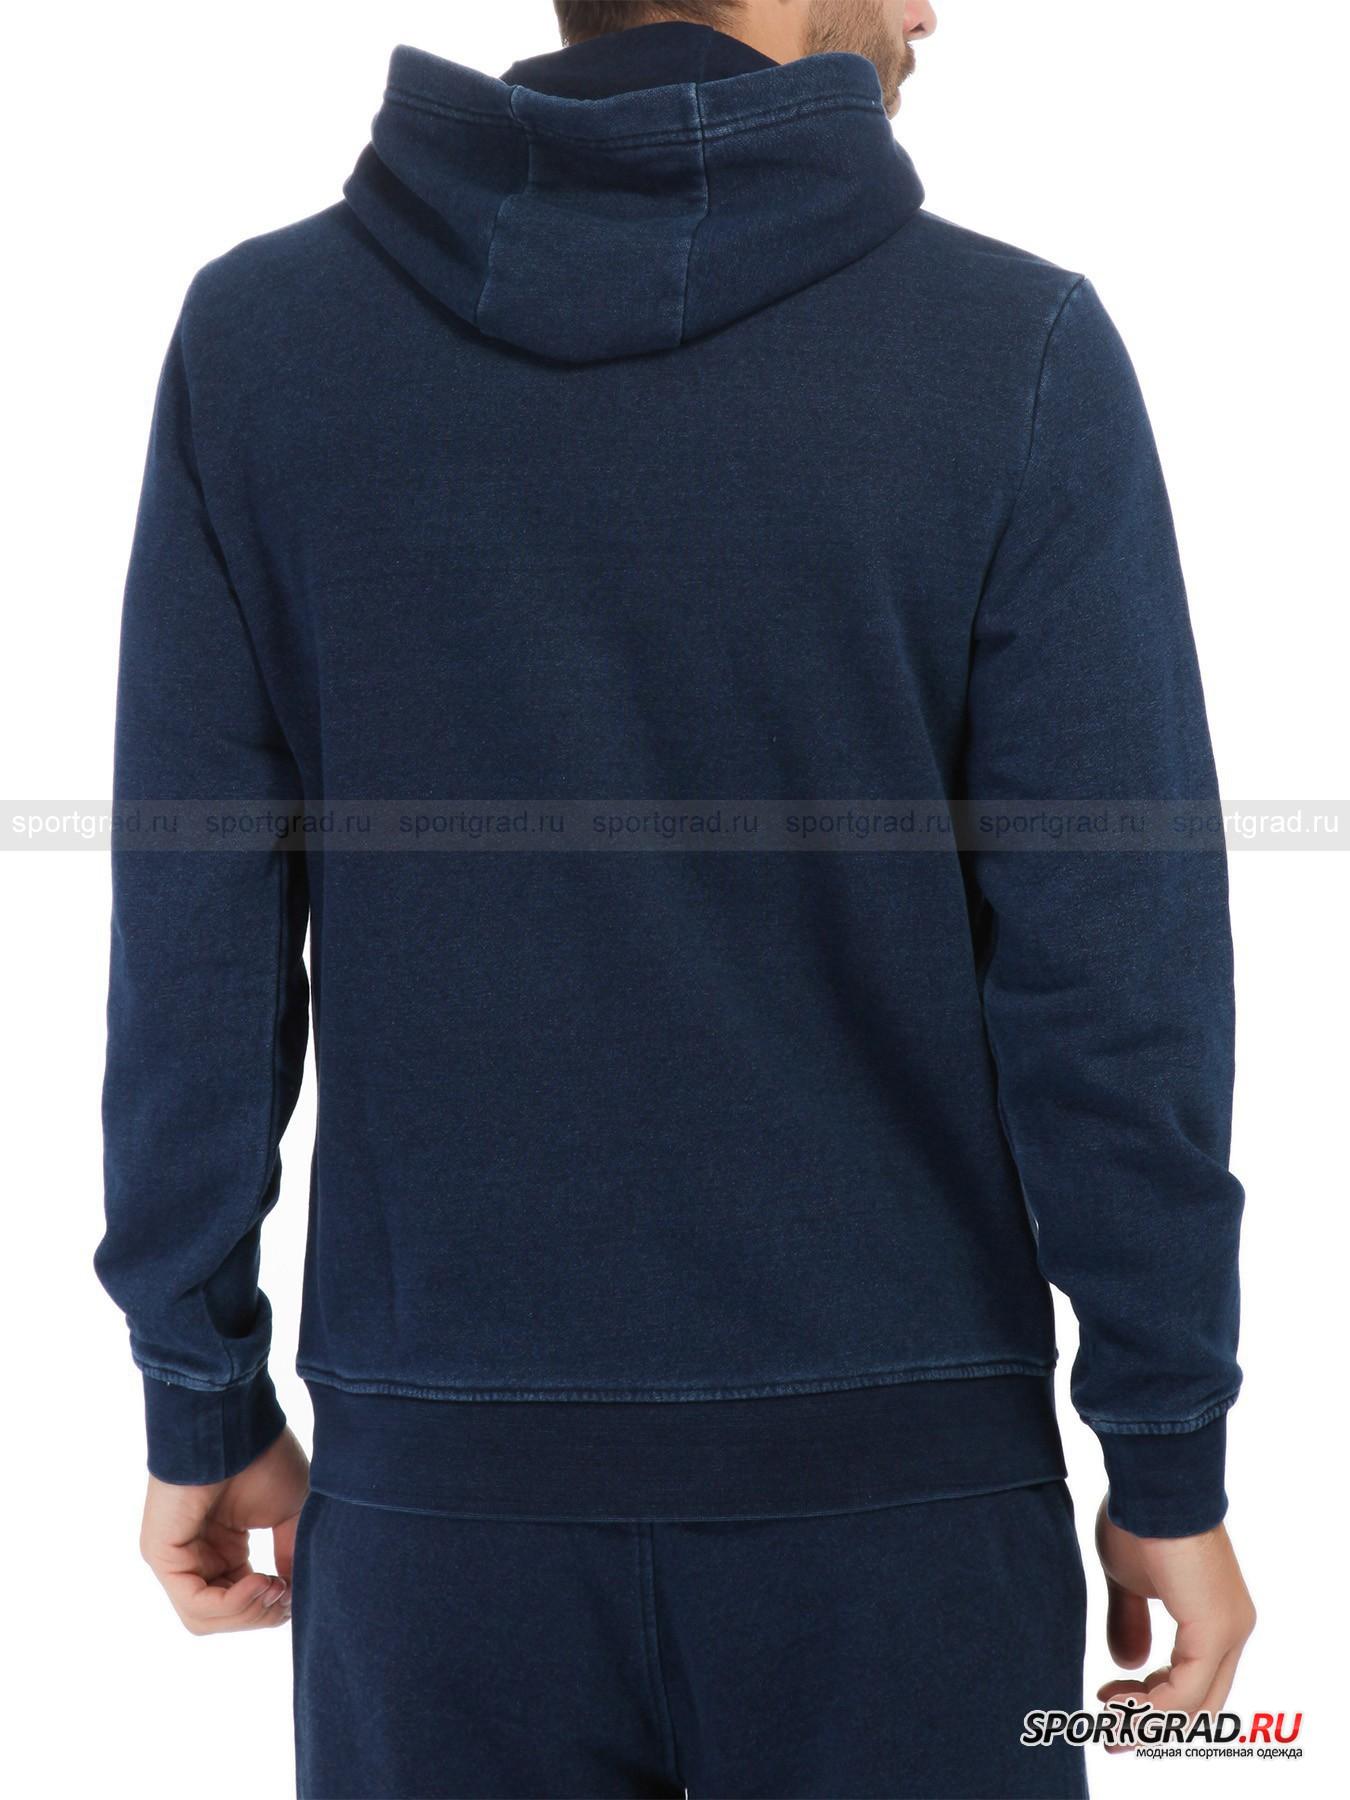 Толстовка мужская Train Inspired Indigo Hoodie Sweatshirt EA7 Emporio Armani от Спортград